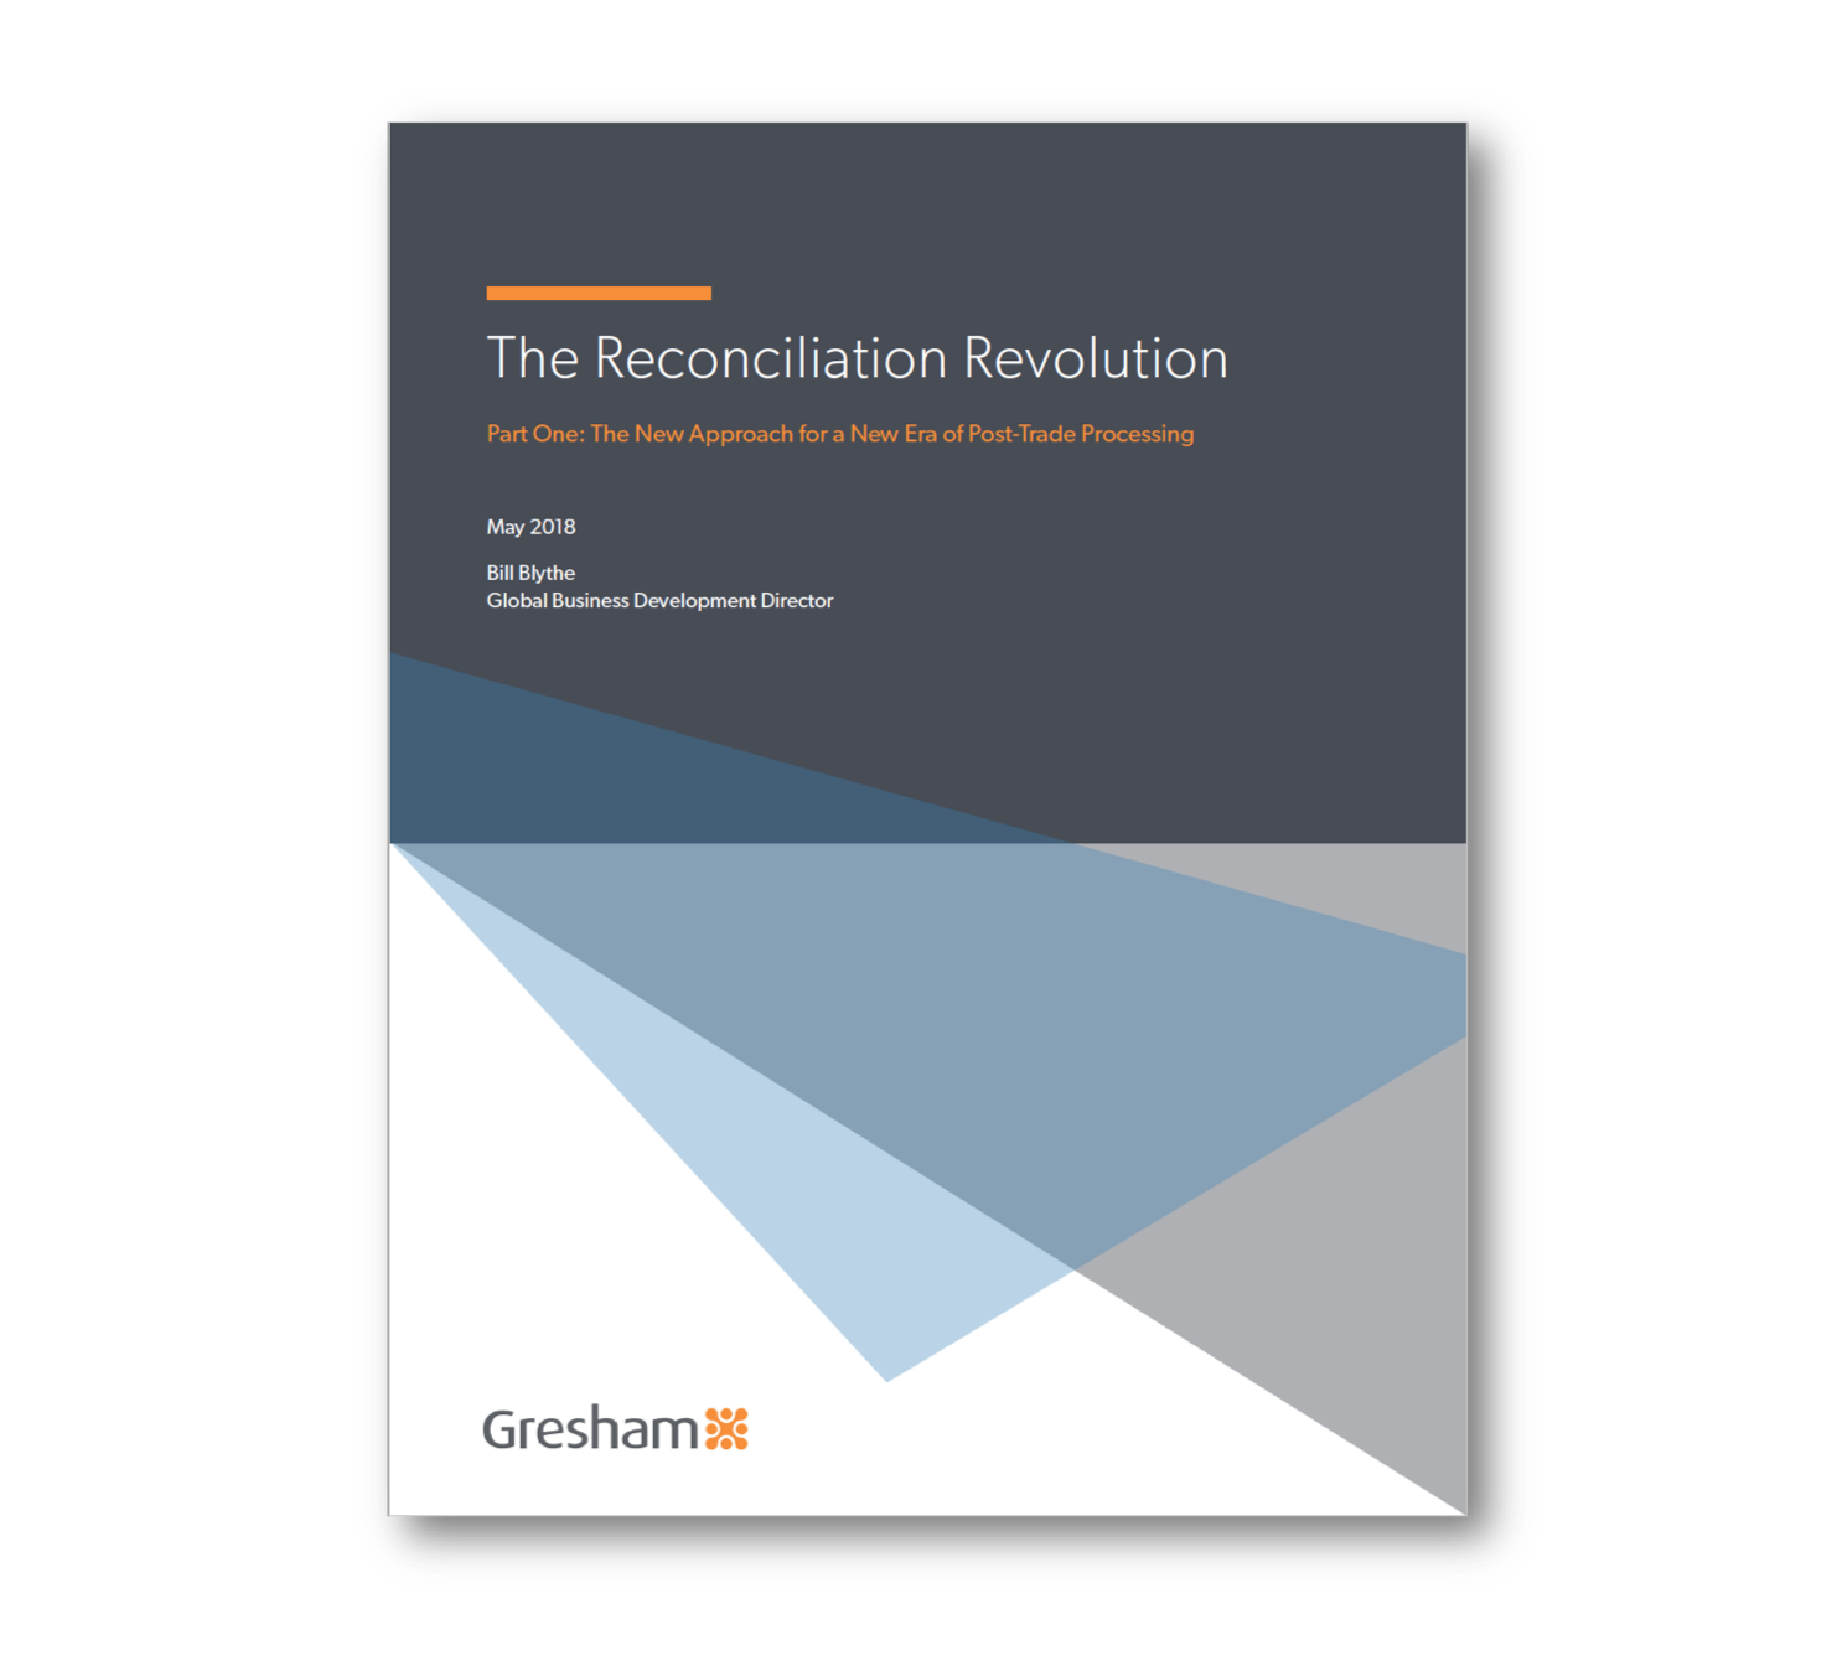 The Reconciliation Revolution - Part One